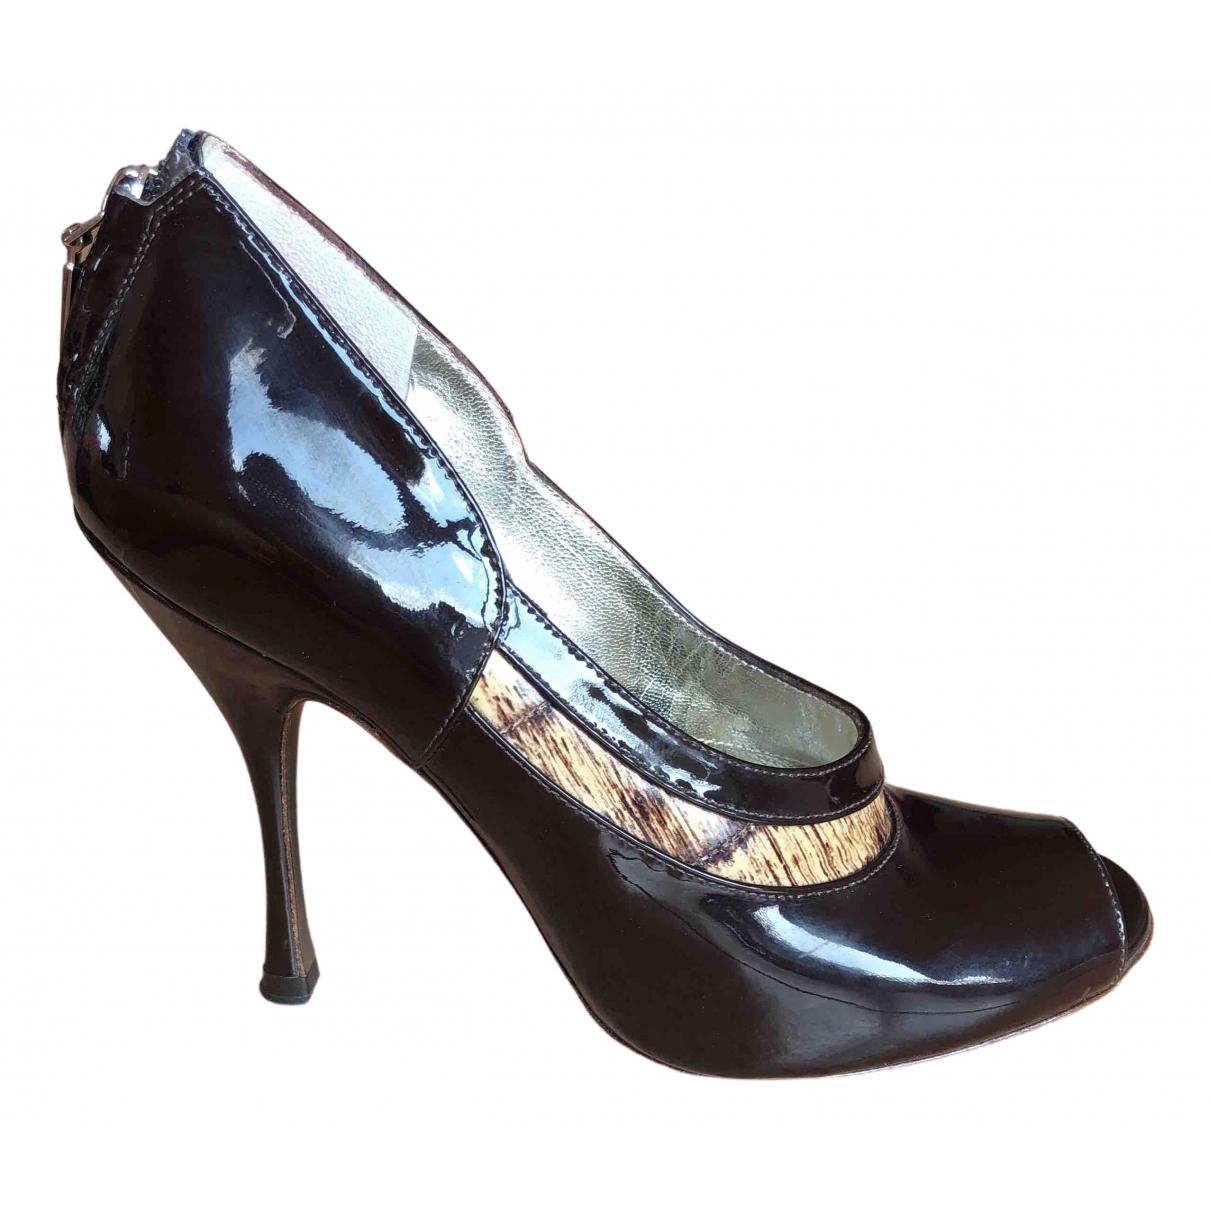 Dolce & Gabbana N Brown Patent leather Heels for Women 36.5 EU